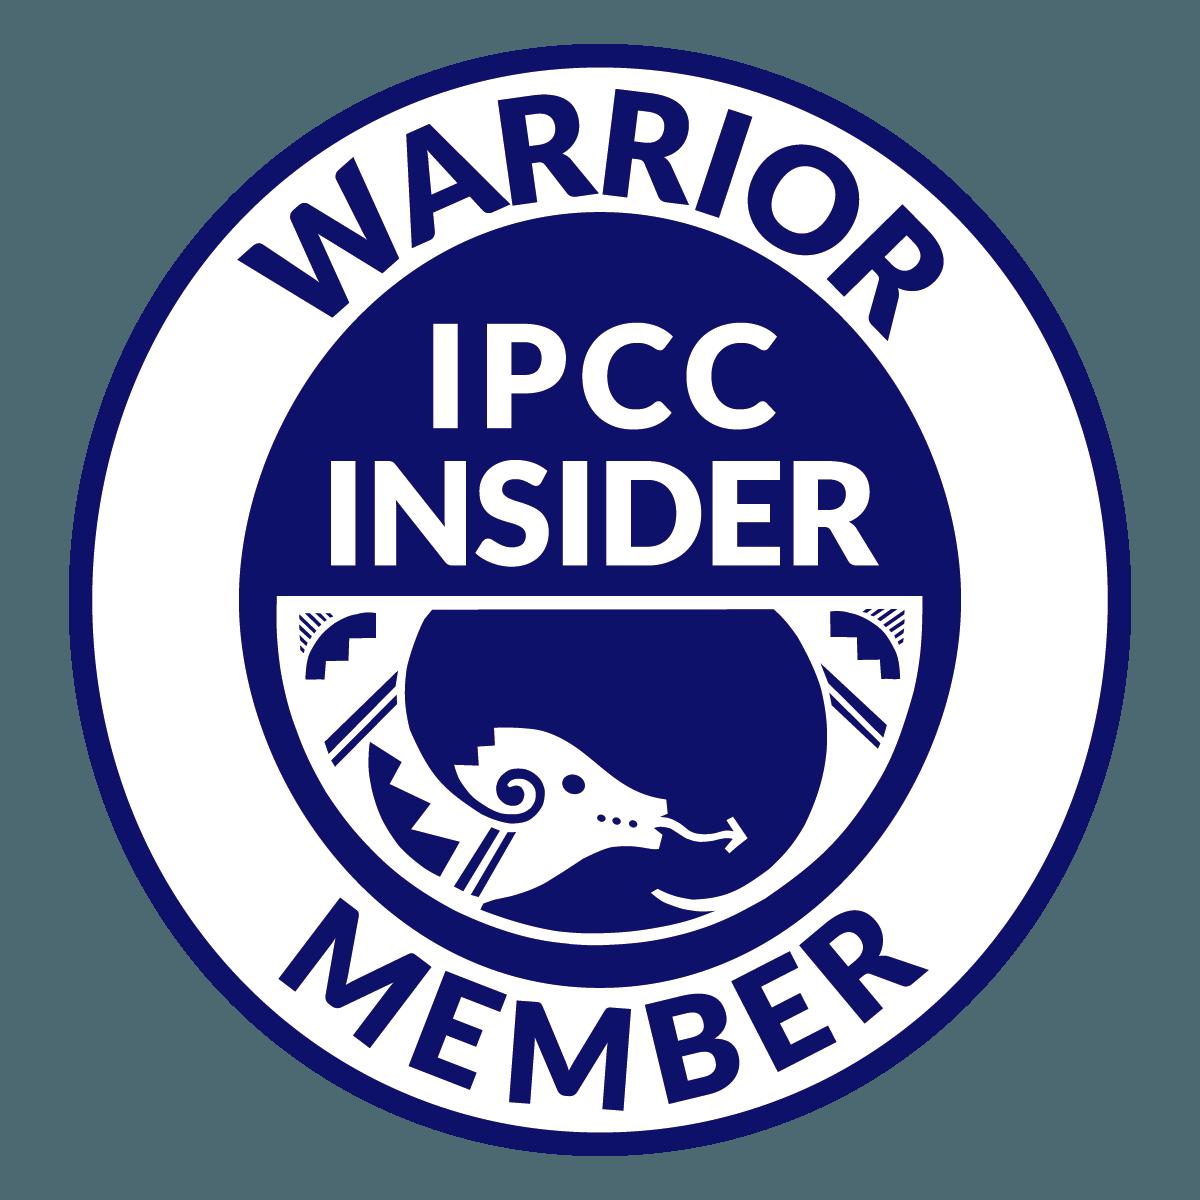 Warrior Indian Pueblo Cultural Center Membership Level